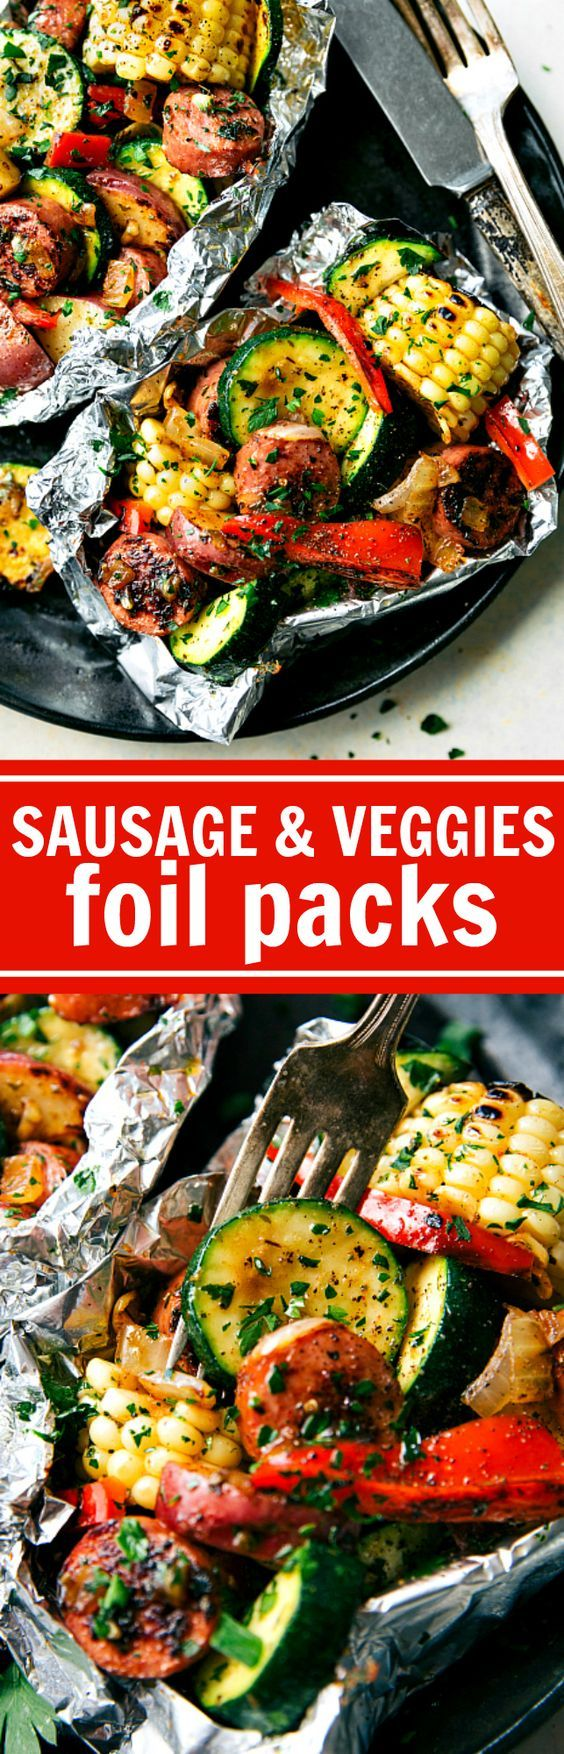 (6) Easy Tin Foil Sausage and Veggies Dinner | Recipe